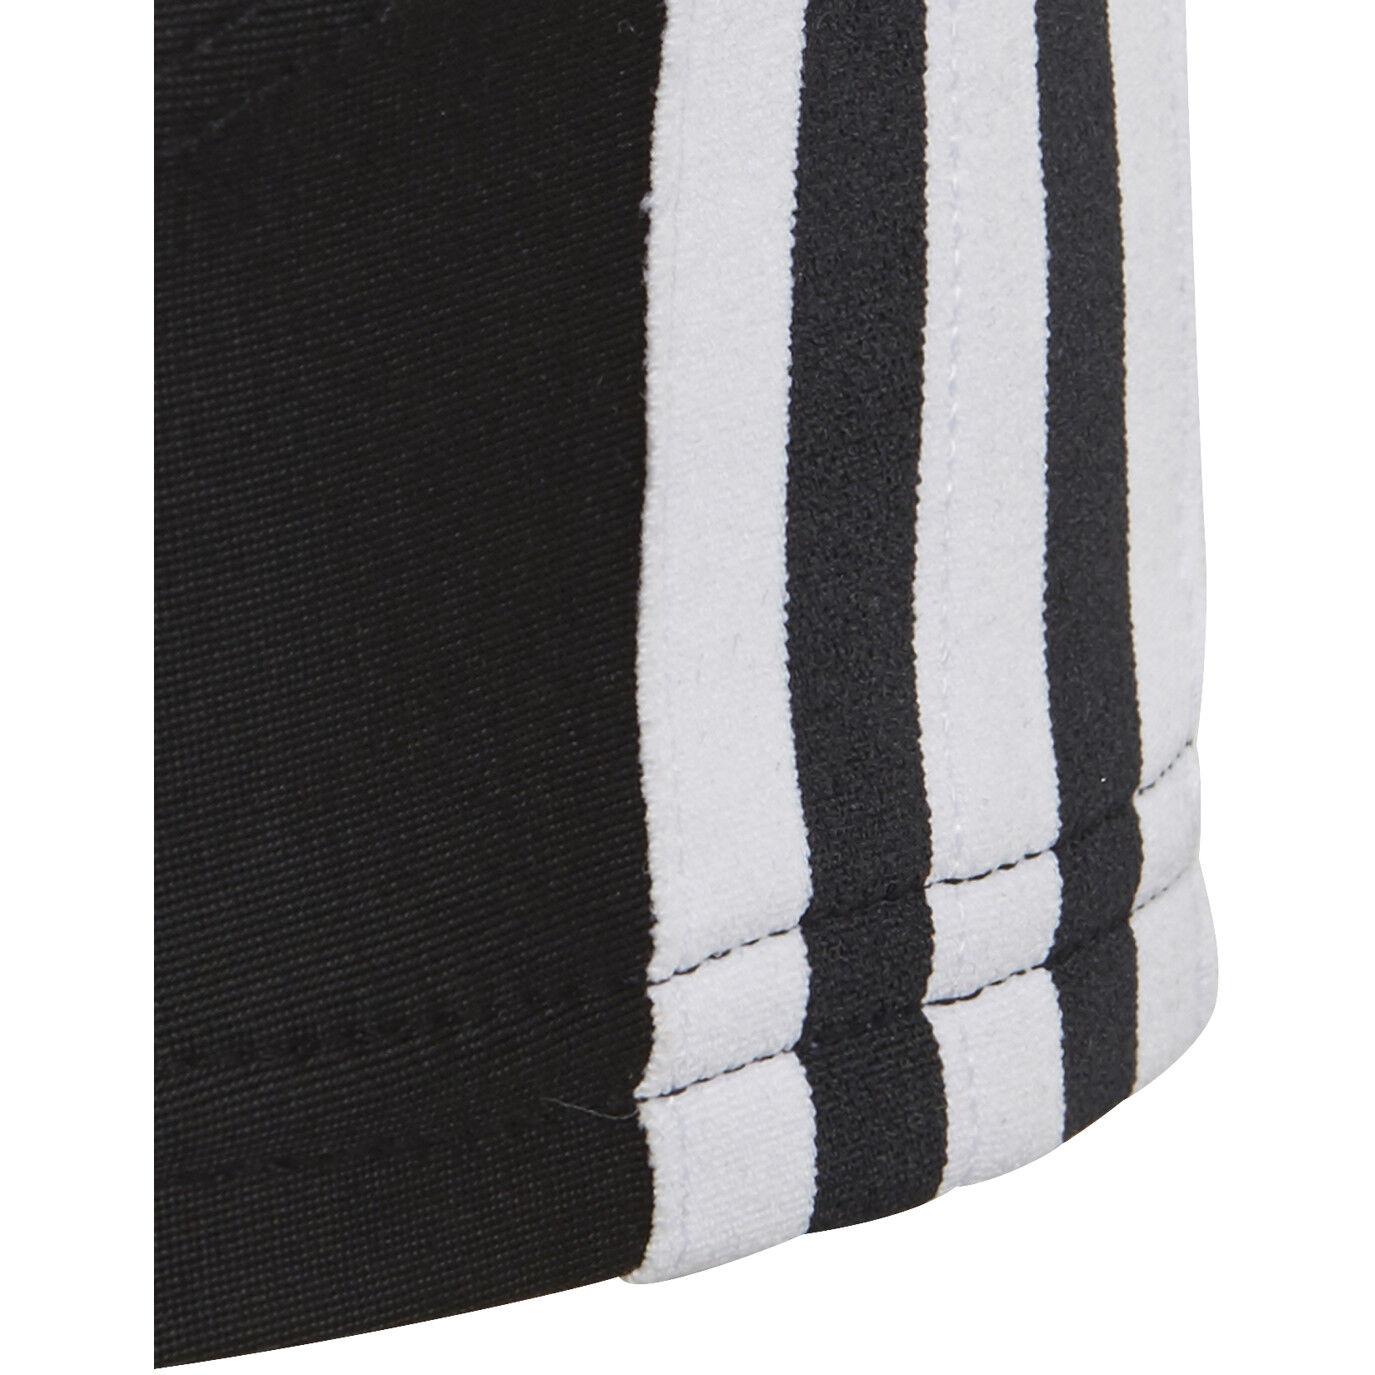 adidas Fit 3 Stripes 2 Piece Bikini Mädchen blackwhite Kindergröße 13 14Y   164